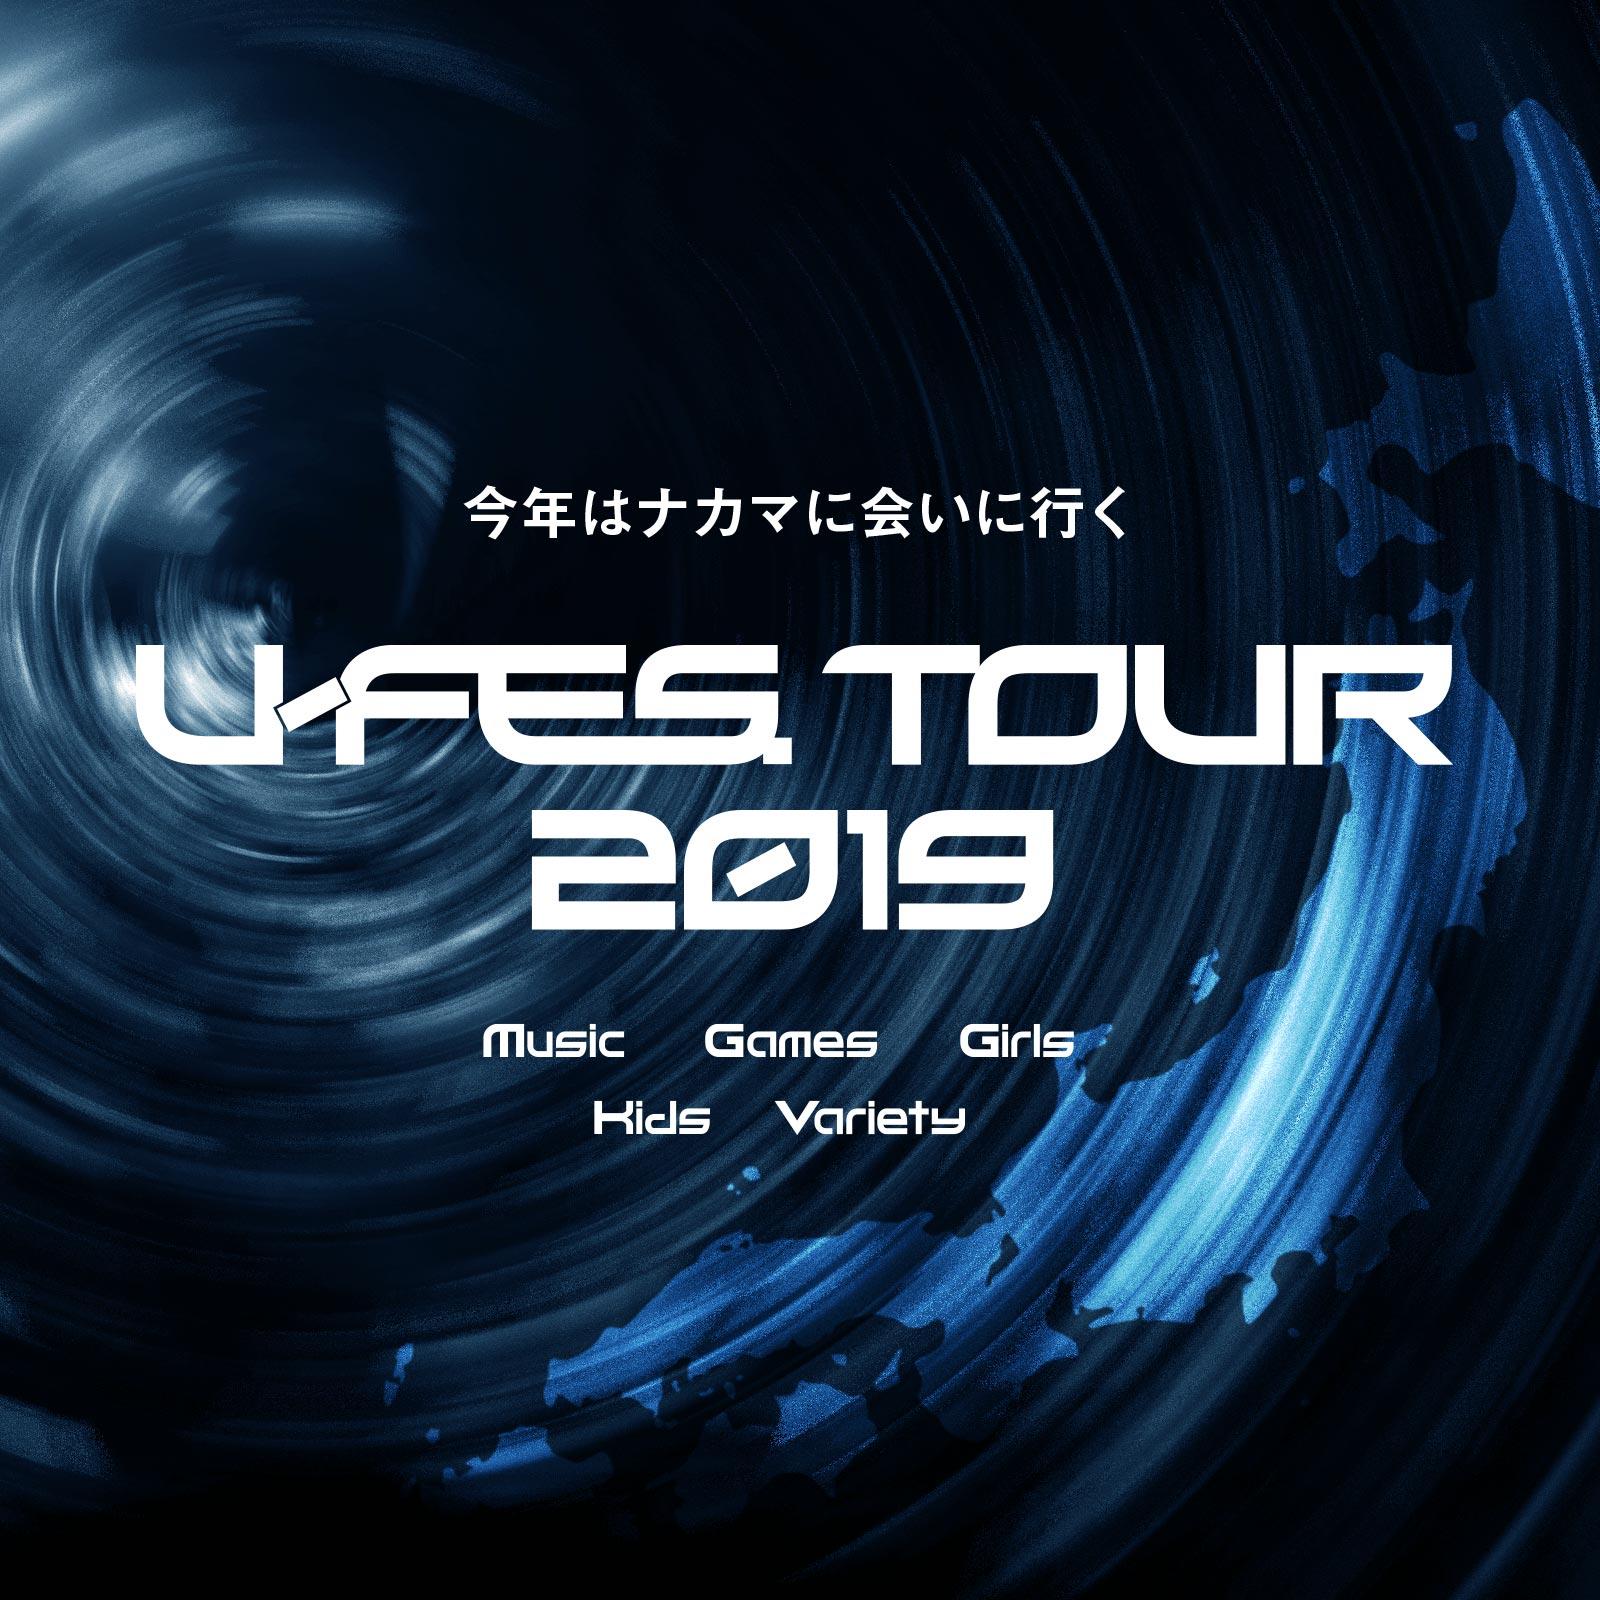 「U-FES. TOUR 2019」今年はナカマに会いに行く